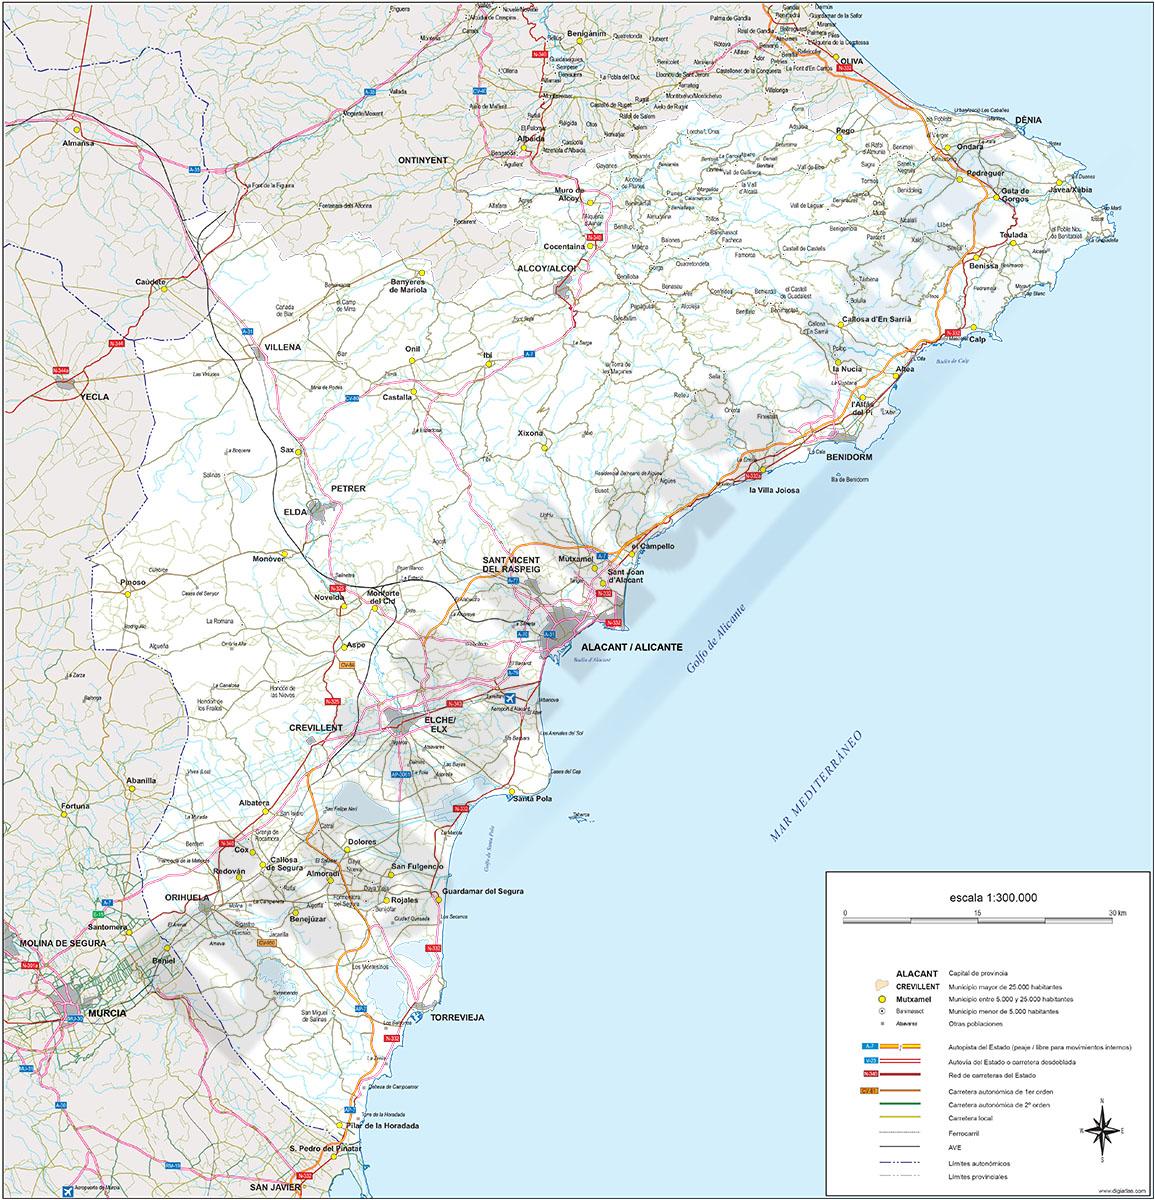 Alicante - Mapa de la provincia